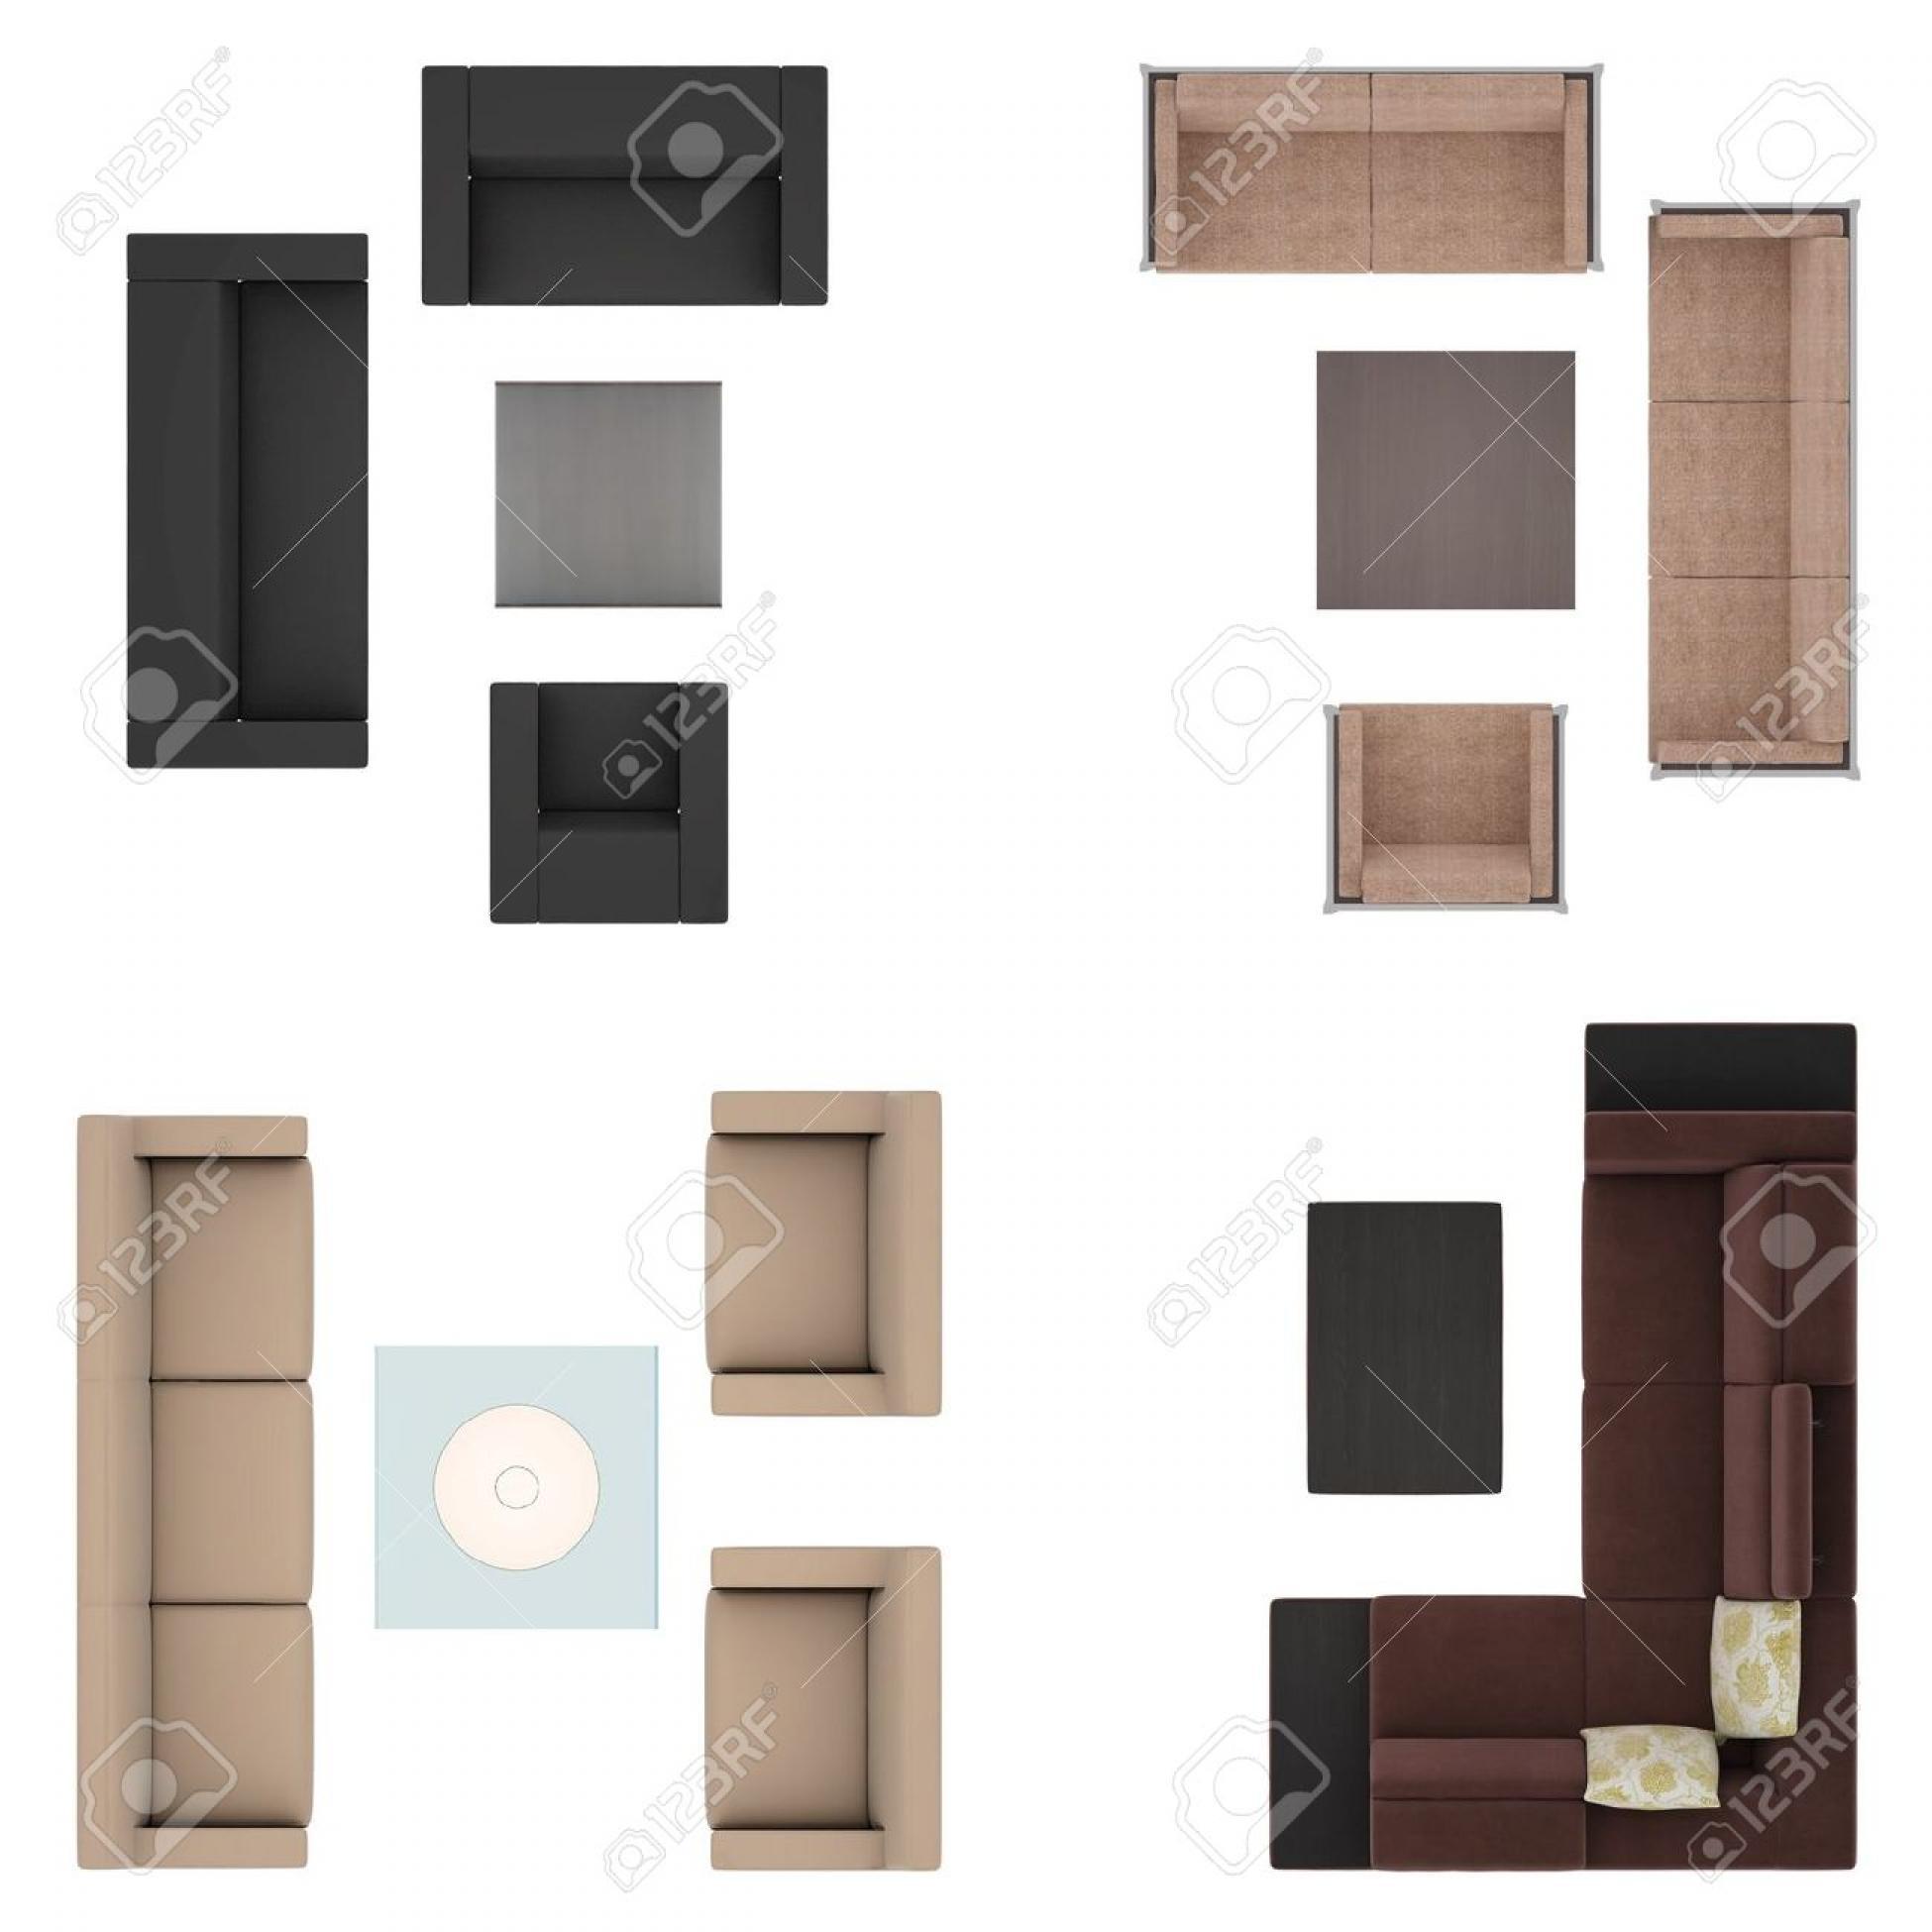 dessus canape. Black Bedroom Furniture Sets. Home Design Ideas